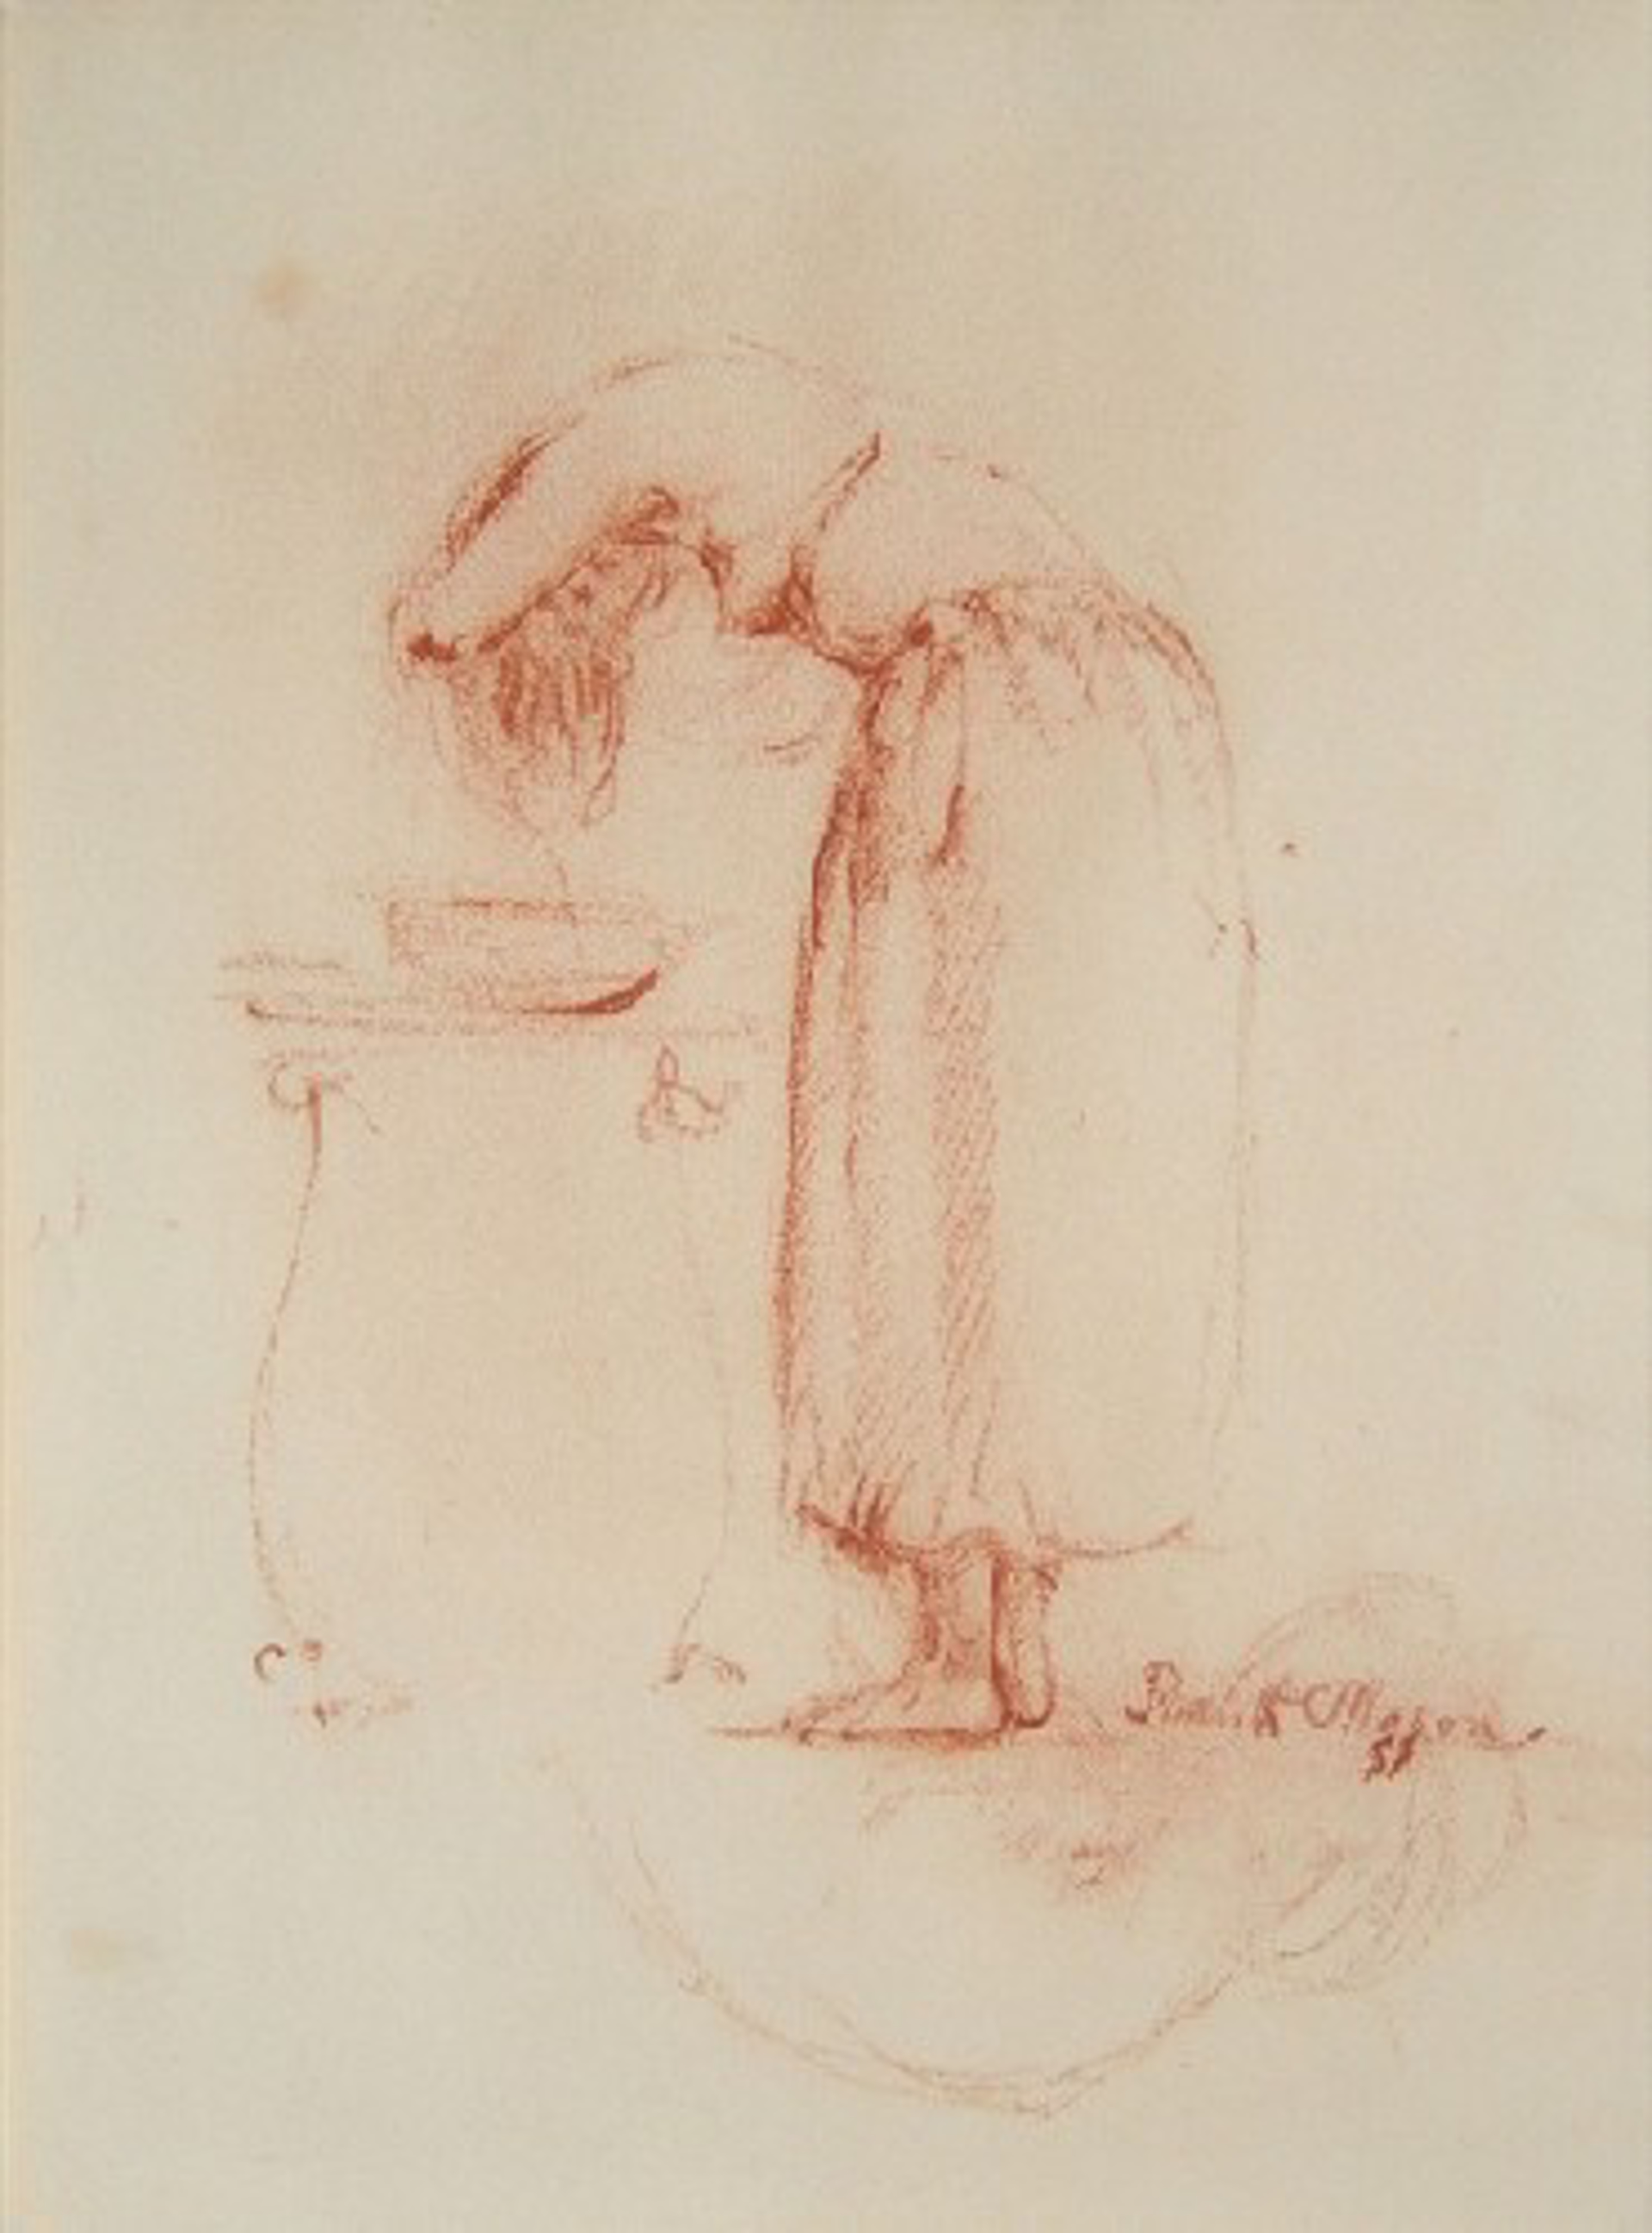 Woman Washing Hair by Frank Mason (1921 - 2009)